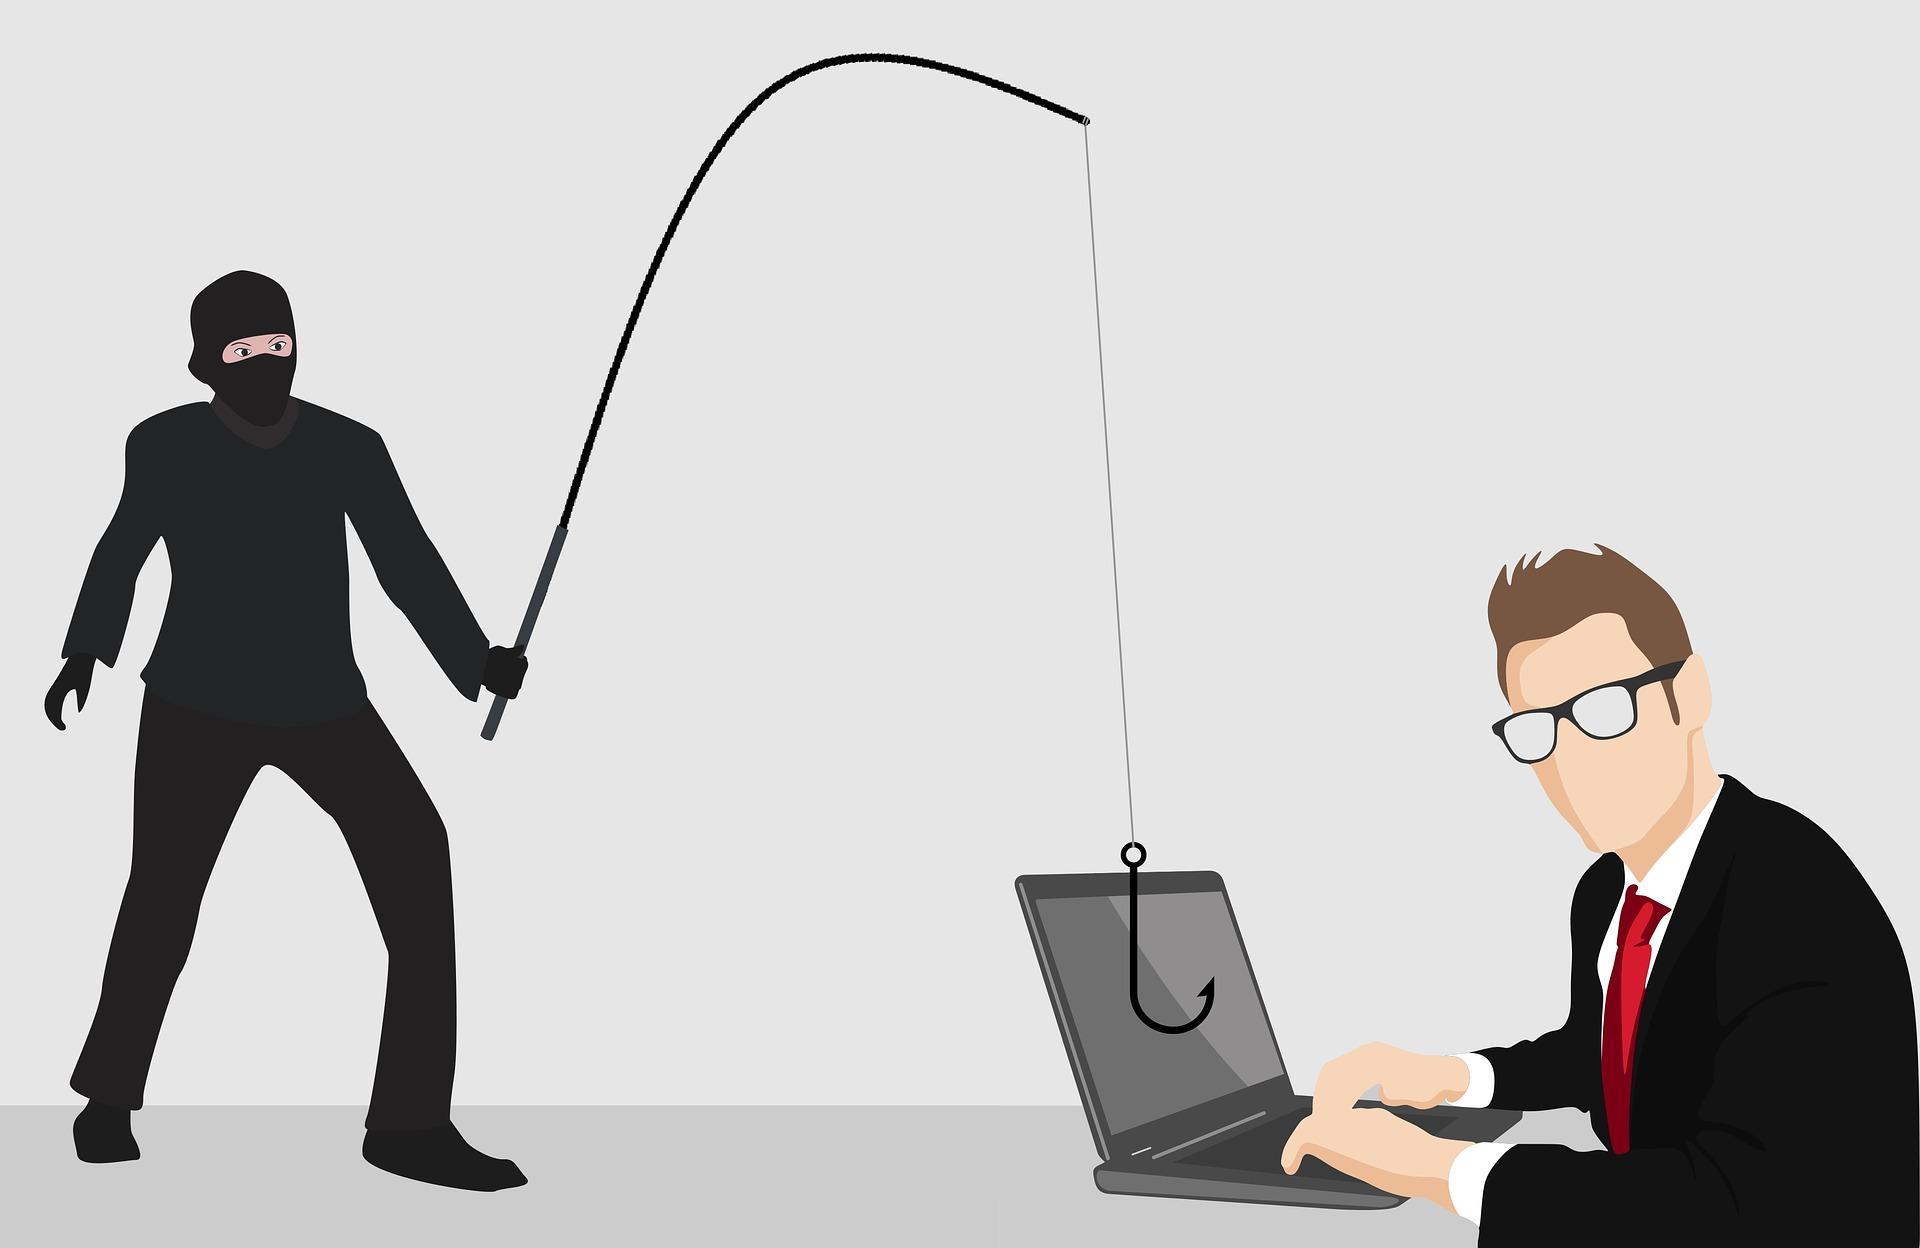 Phishing Email Scam - Dear Valid User Final Warning